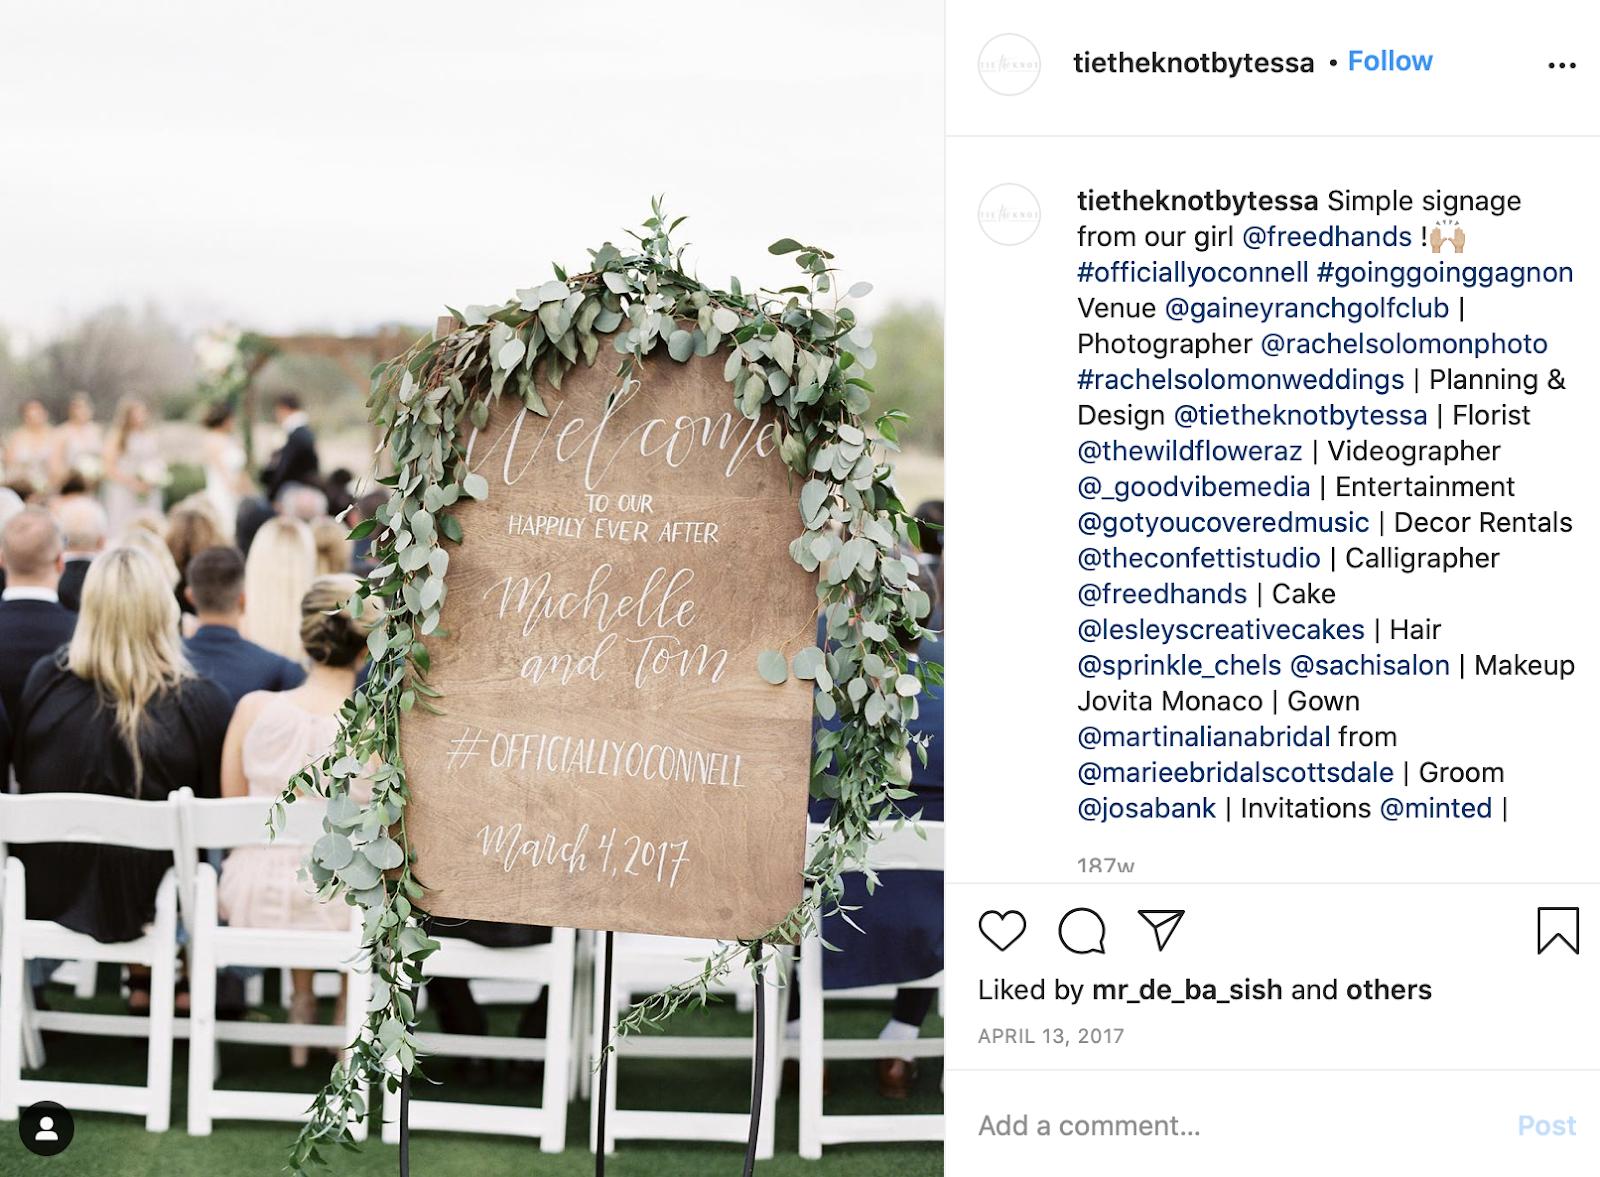 wedding hashtag creator - hashtag being used at the wedding